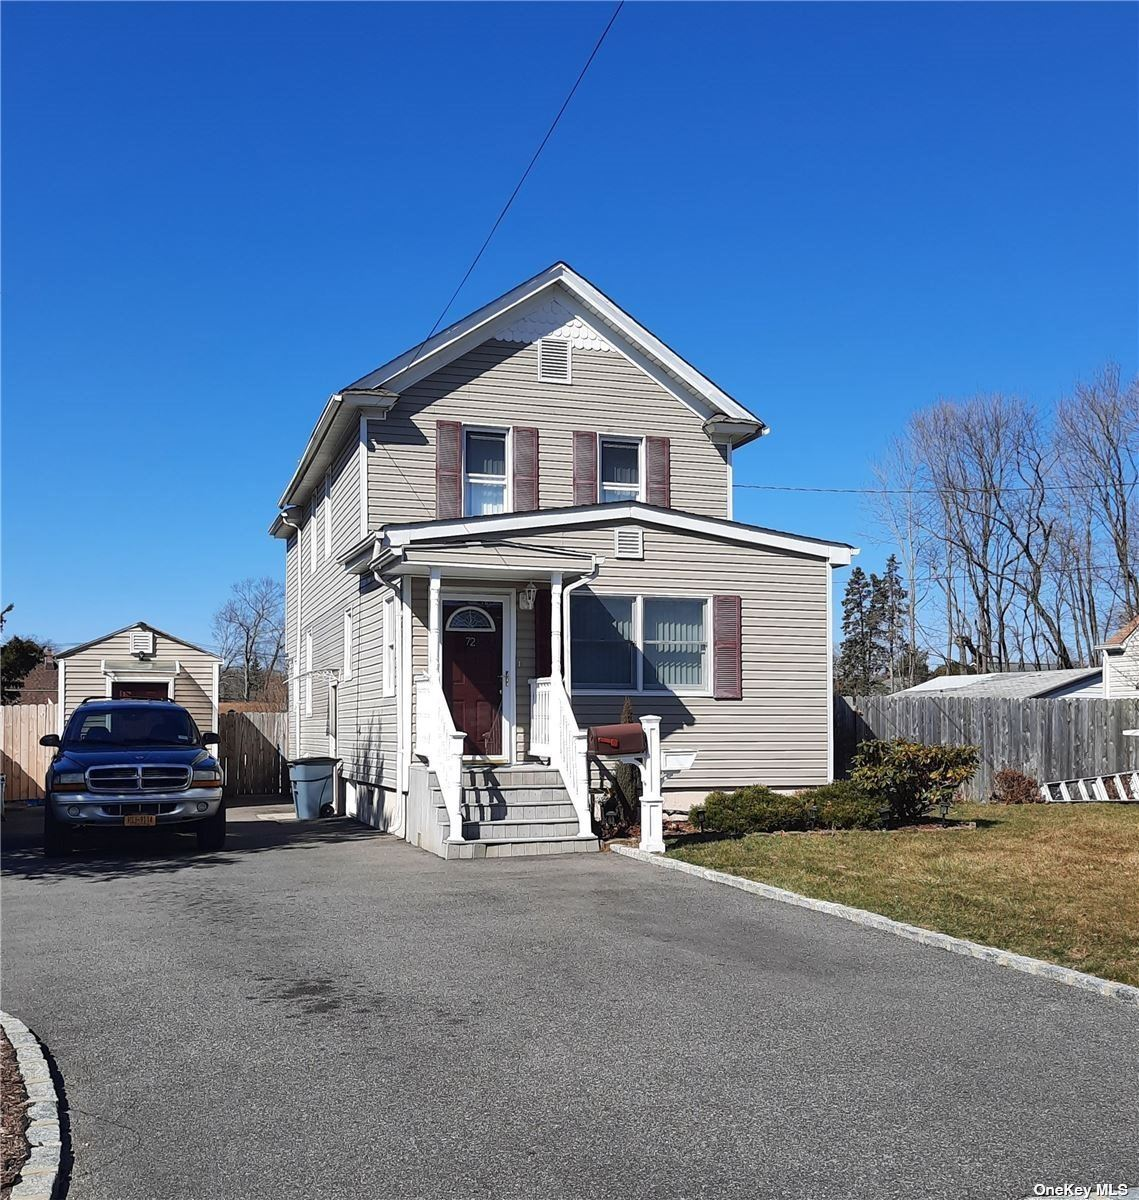 72 Winganhauppauge Road, Islip, NY 11751 - MLS#: 3296266